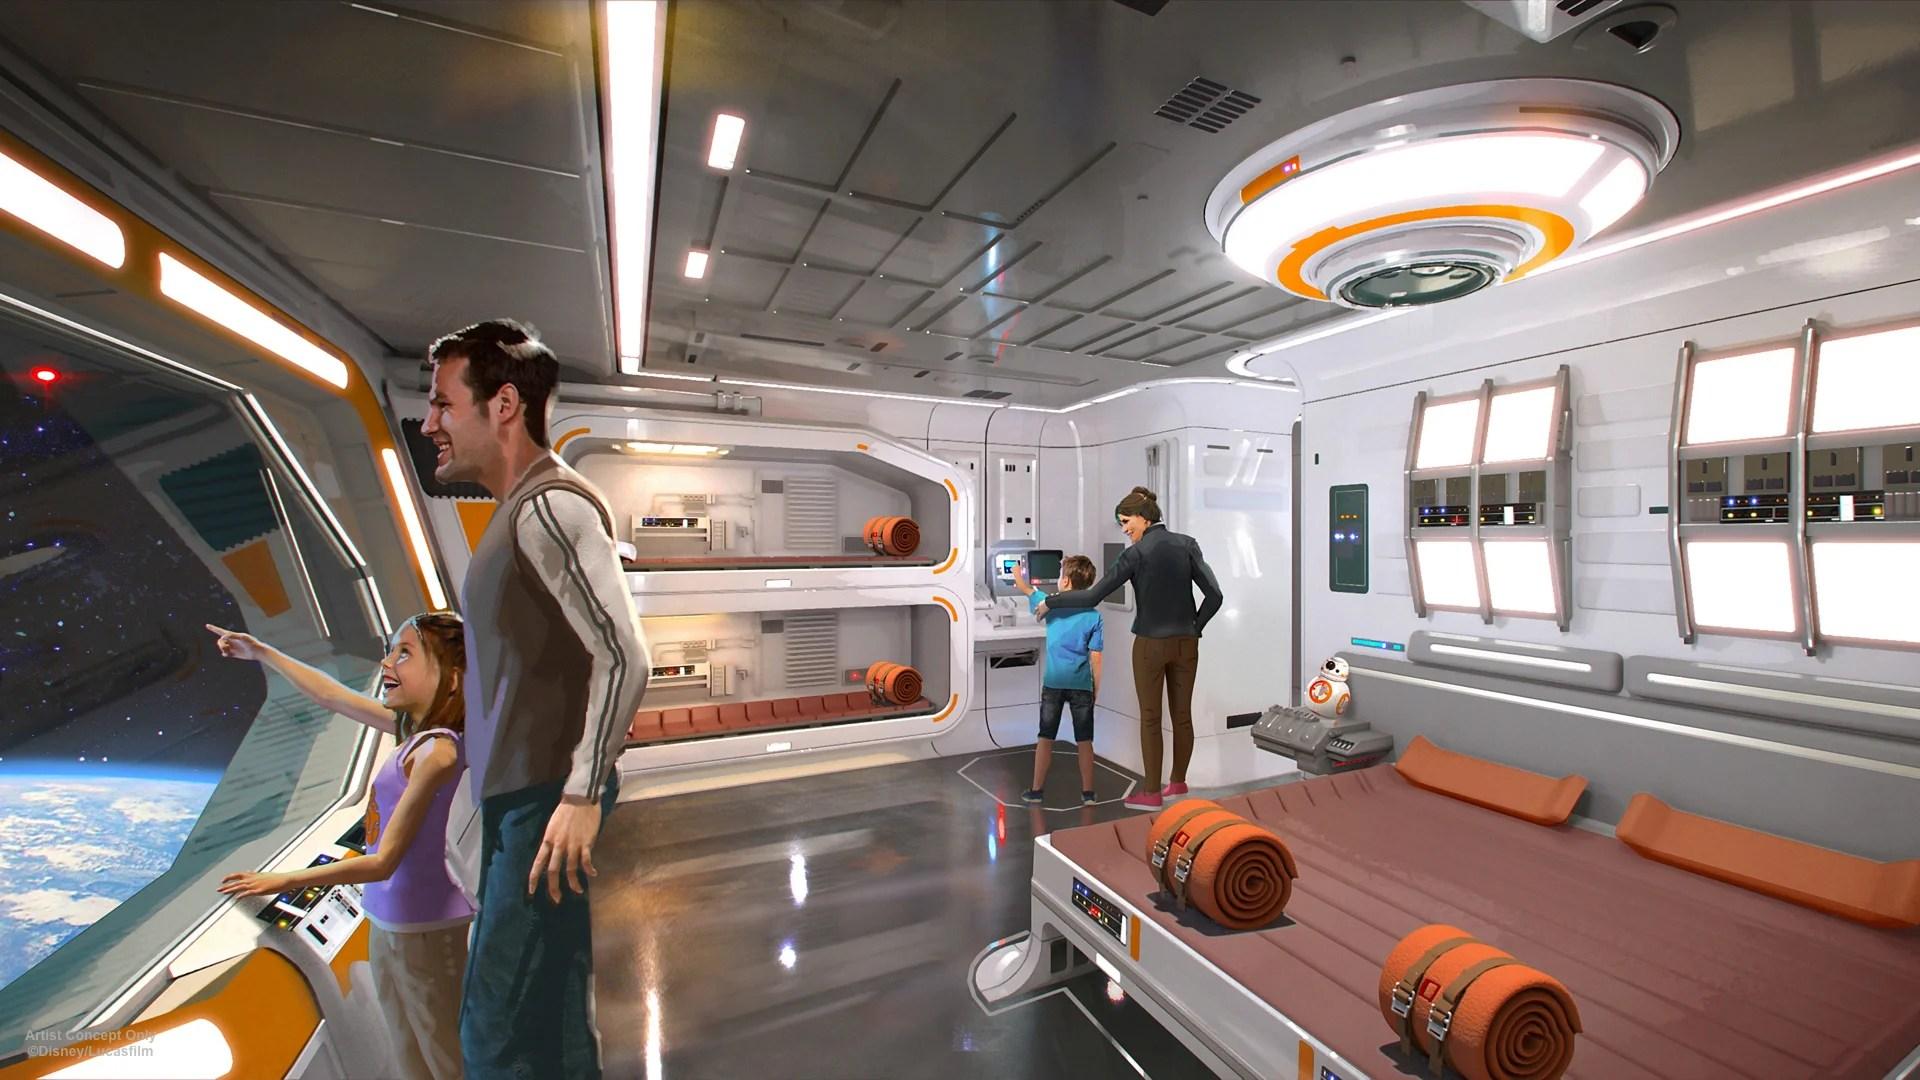 Magnificent Everything We Know About Disneys Star Wars Hotel Download Free Architecture Designs Rallybritishbridgeorg